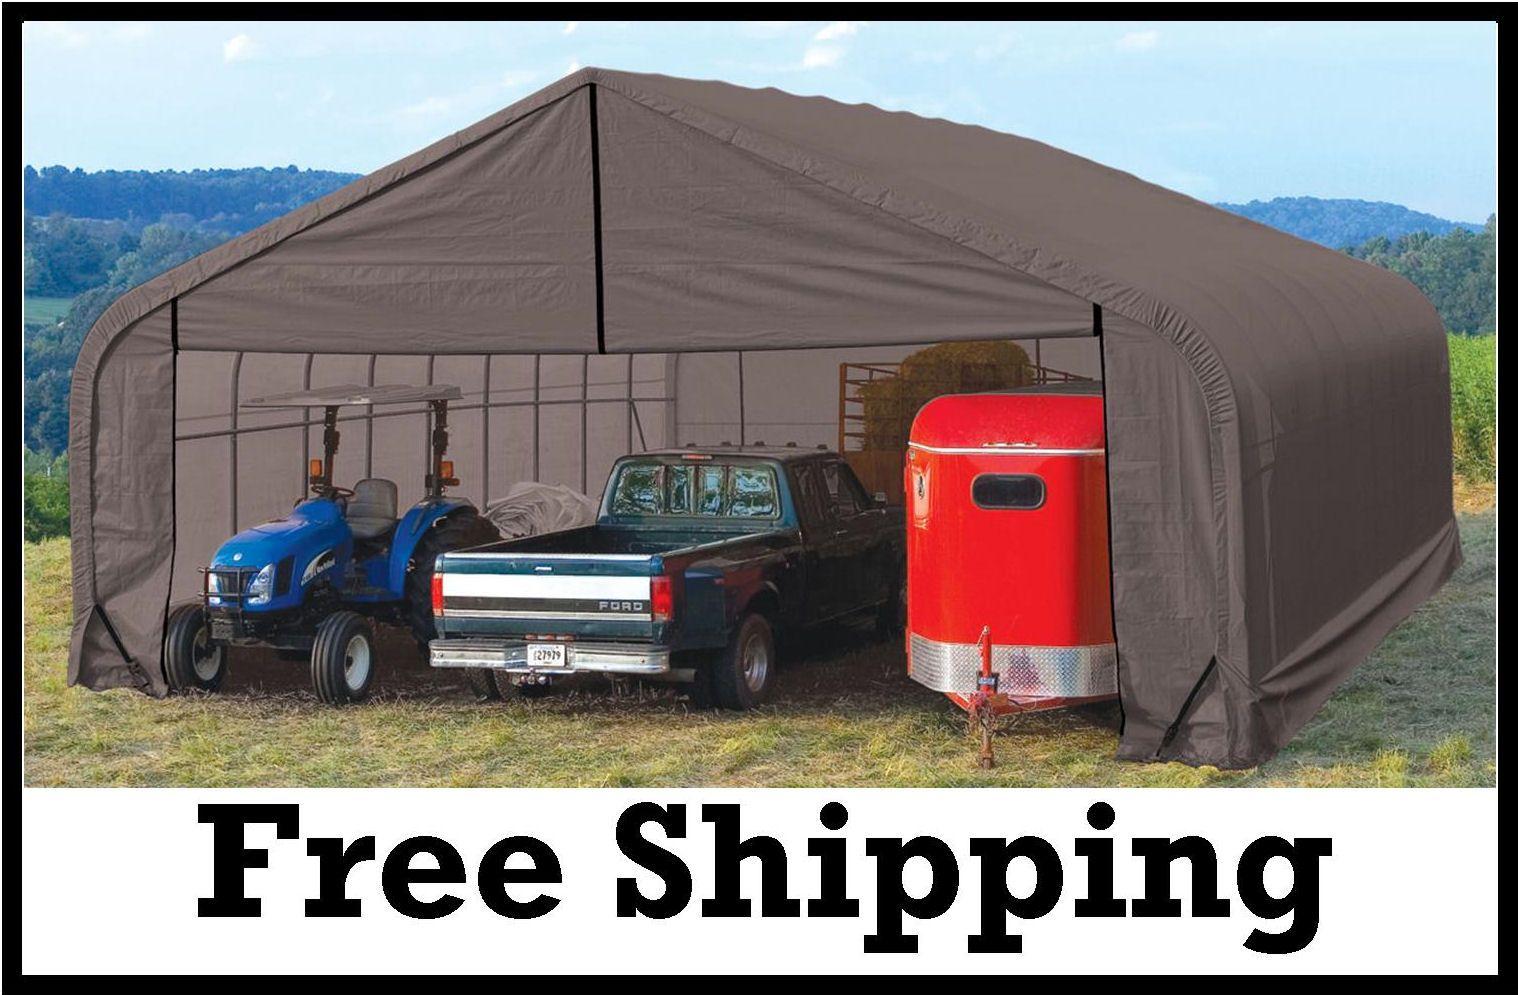 Commercial Portable Garage Storage Peak Roof 30' wide